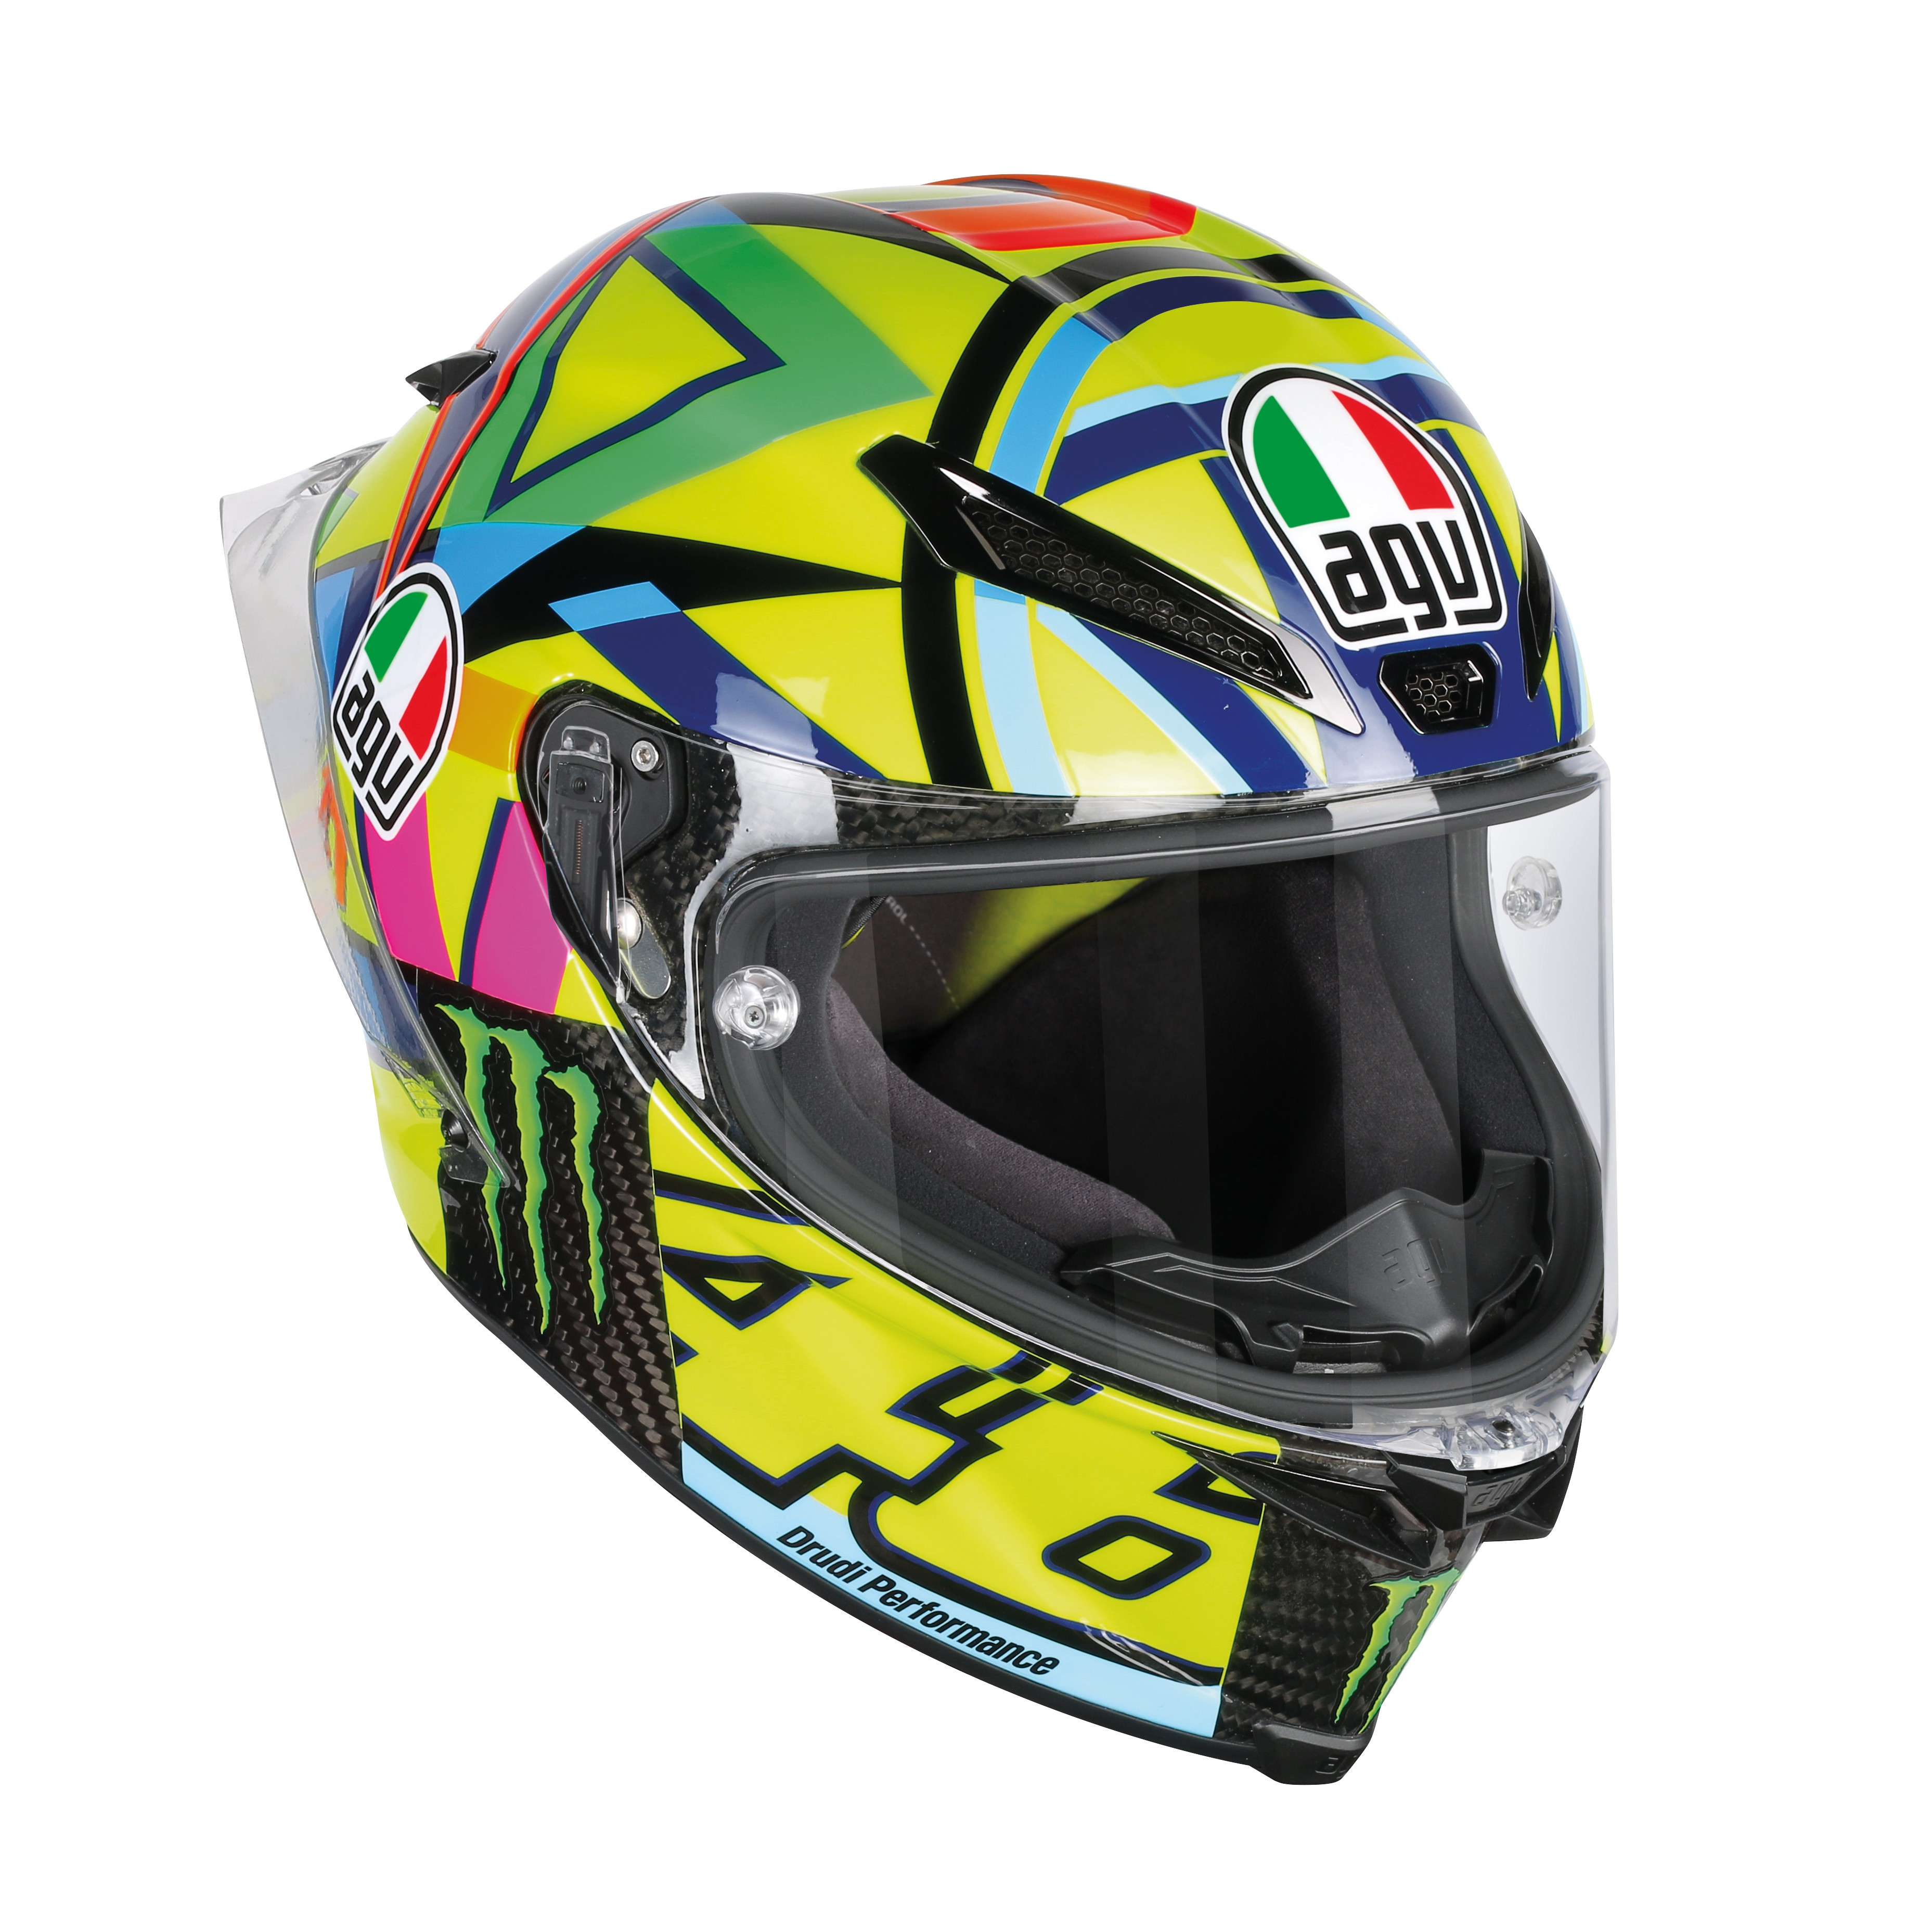 AGV Pista GP-R Soleluna 2016